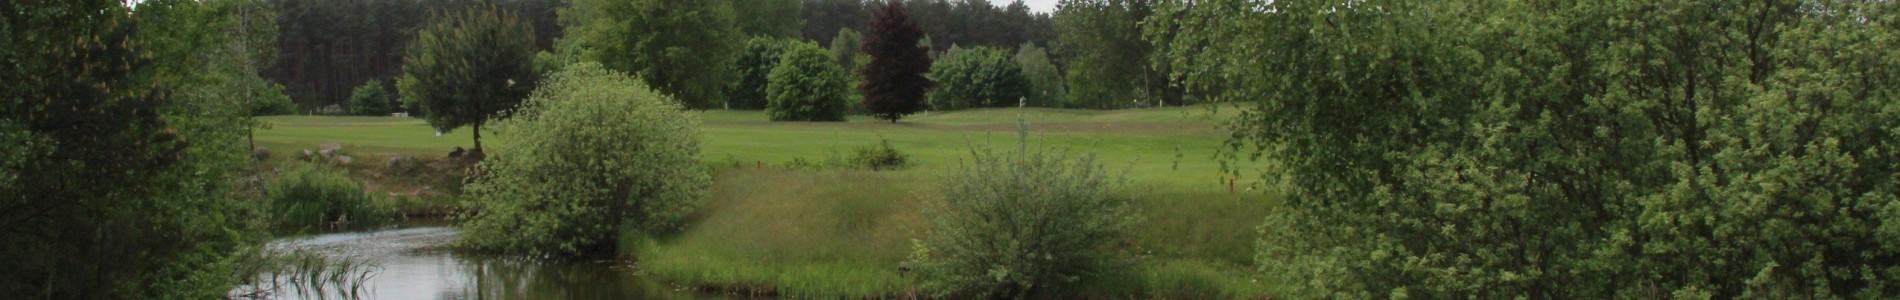 Bild Landschaft in Kallin